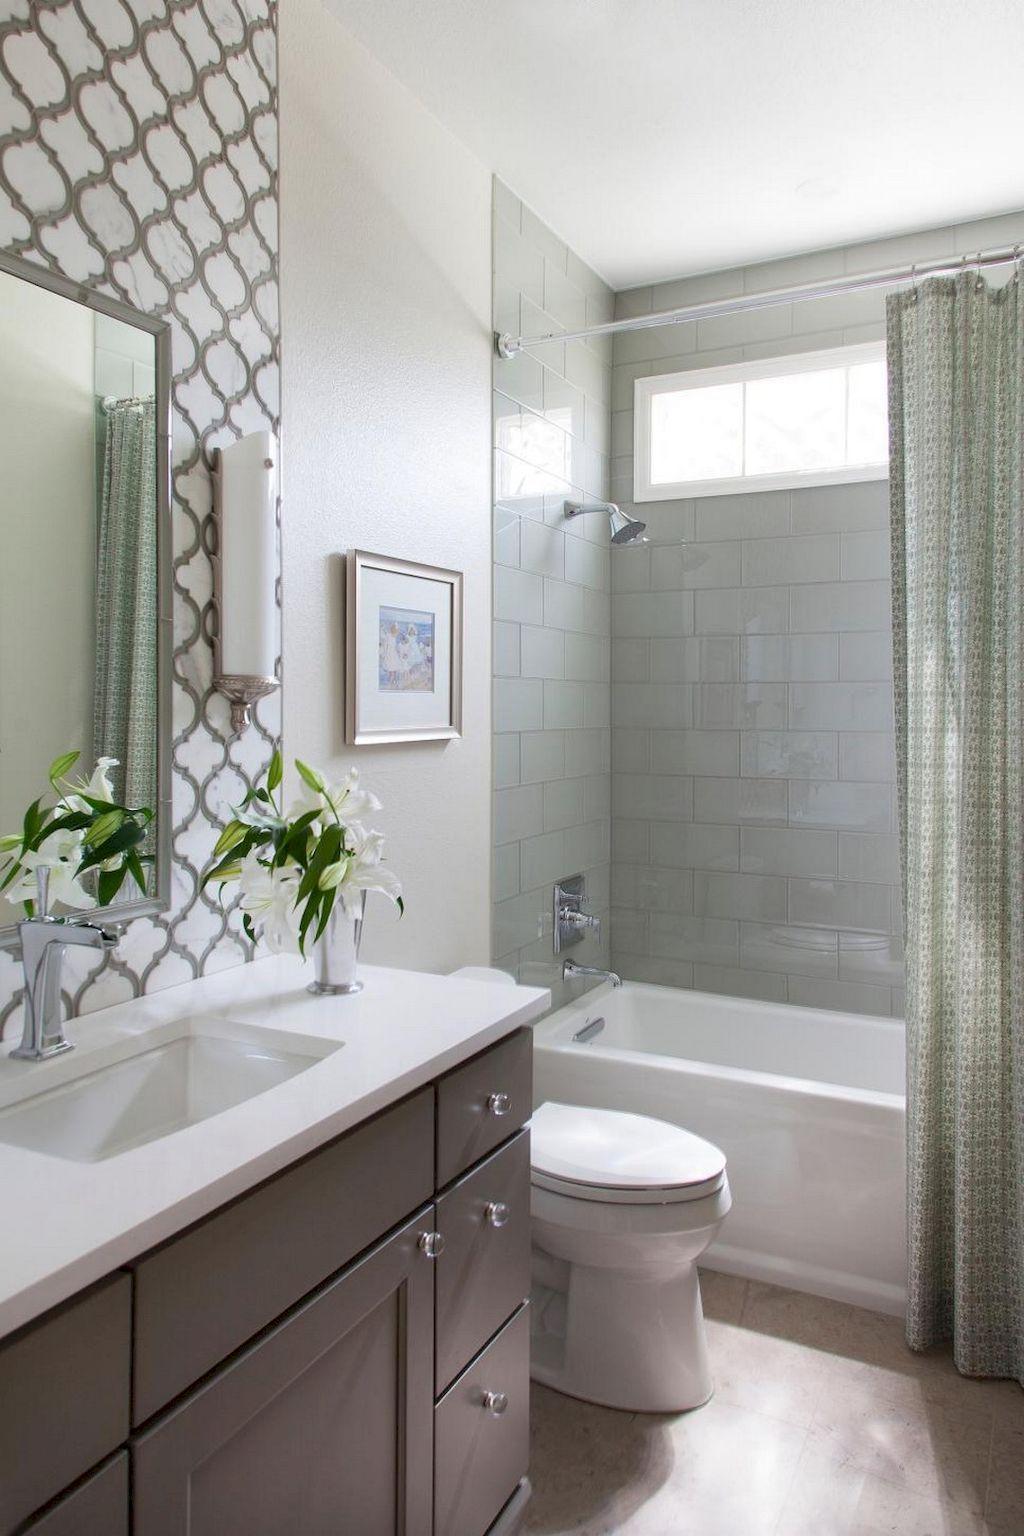 40 Fresh Small Master Bathroom Remodel Ideas on A Budget ...